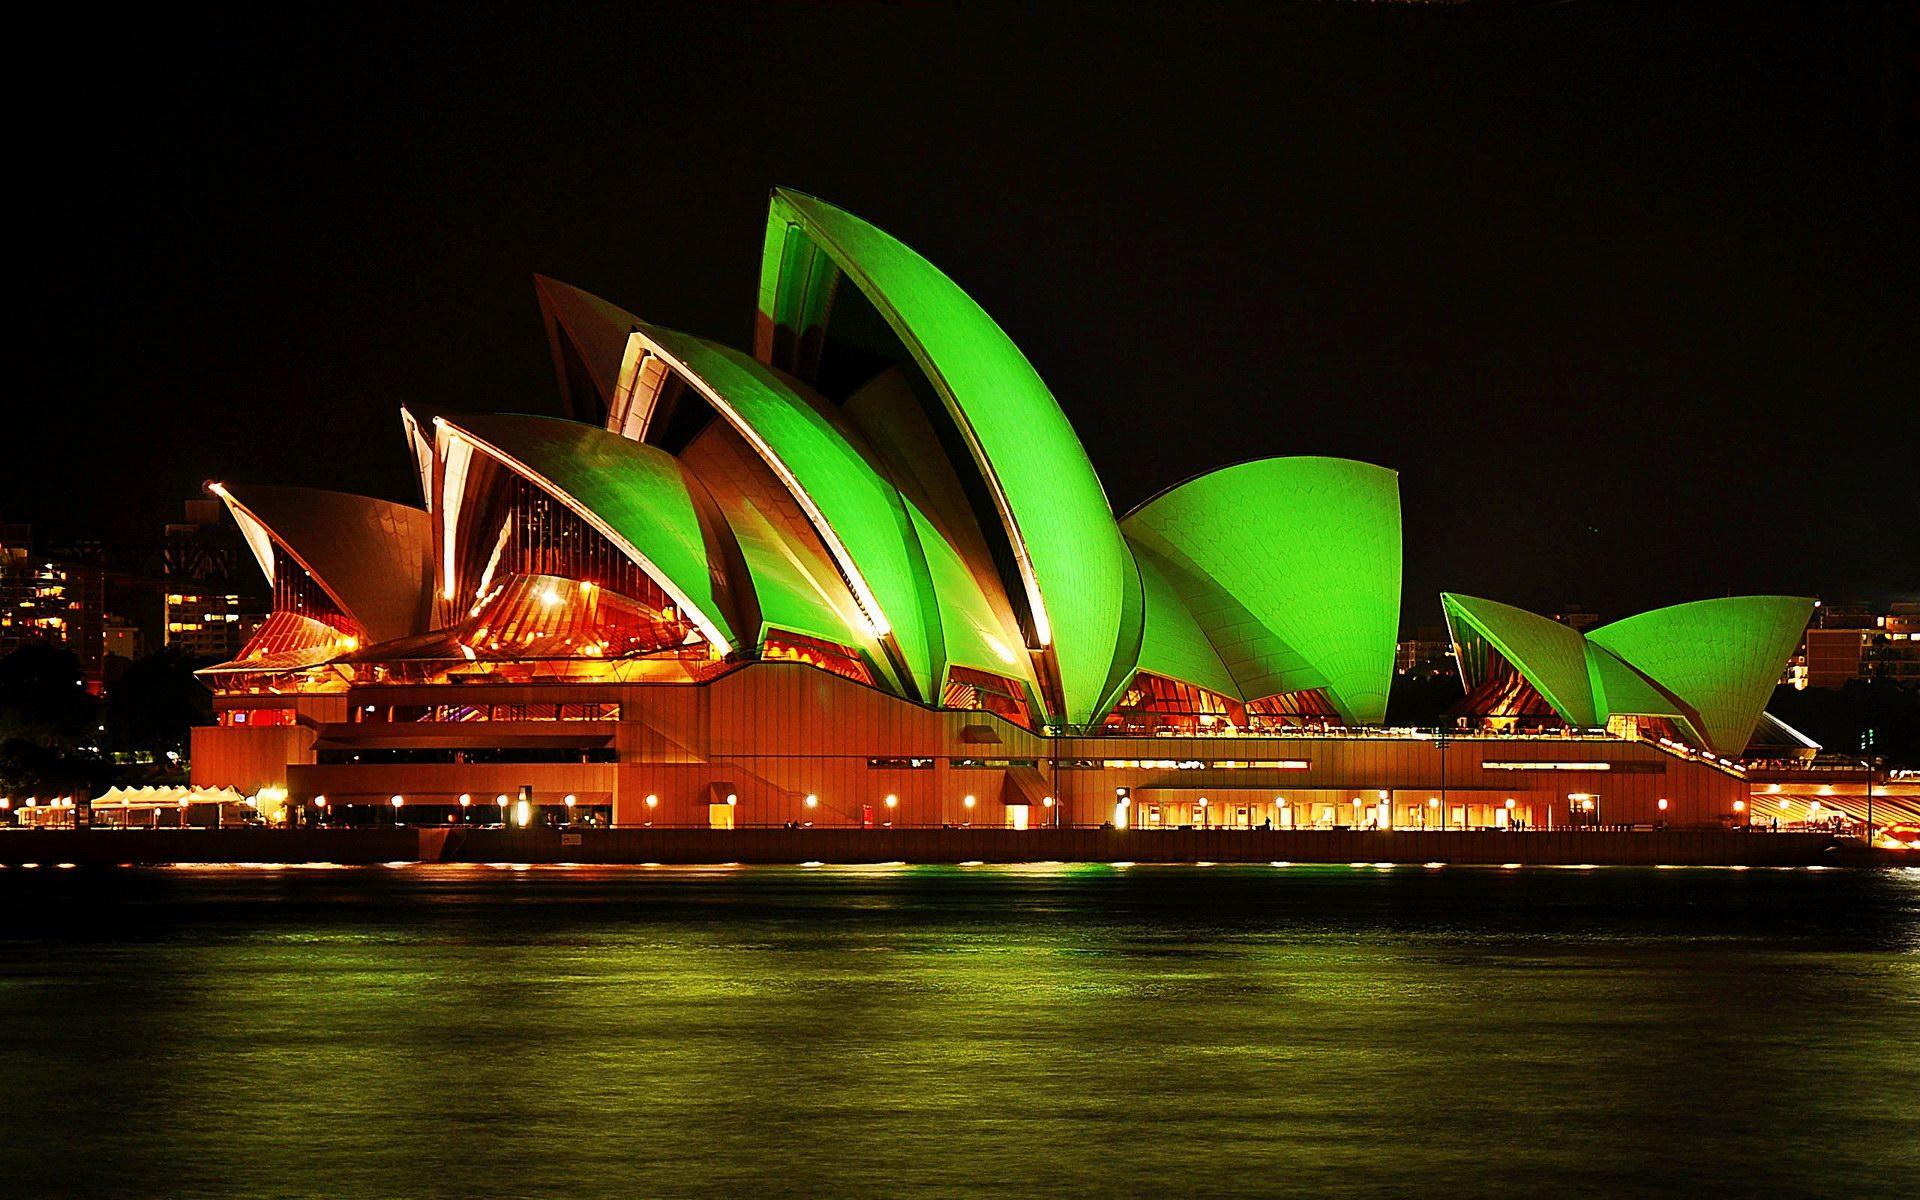 Sydney Opera House Night Lights Wallpaper   Travel HD Wallpapers 1920x1200